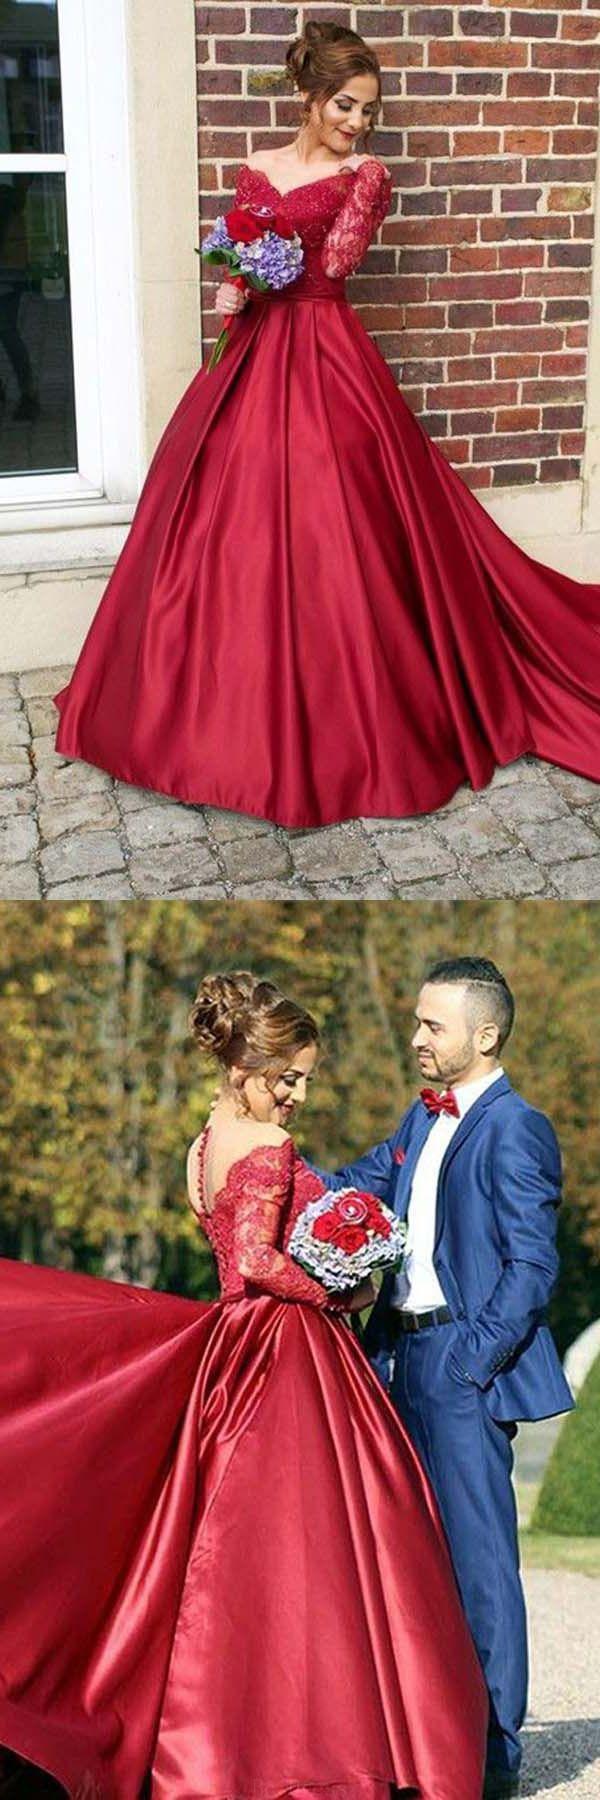 Burgundy prom dress burgundypromdress long sleeves prom dress